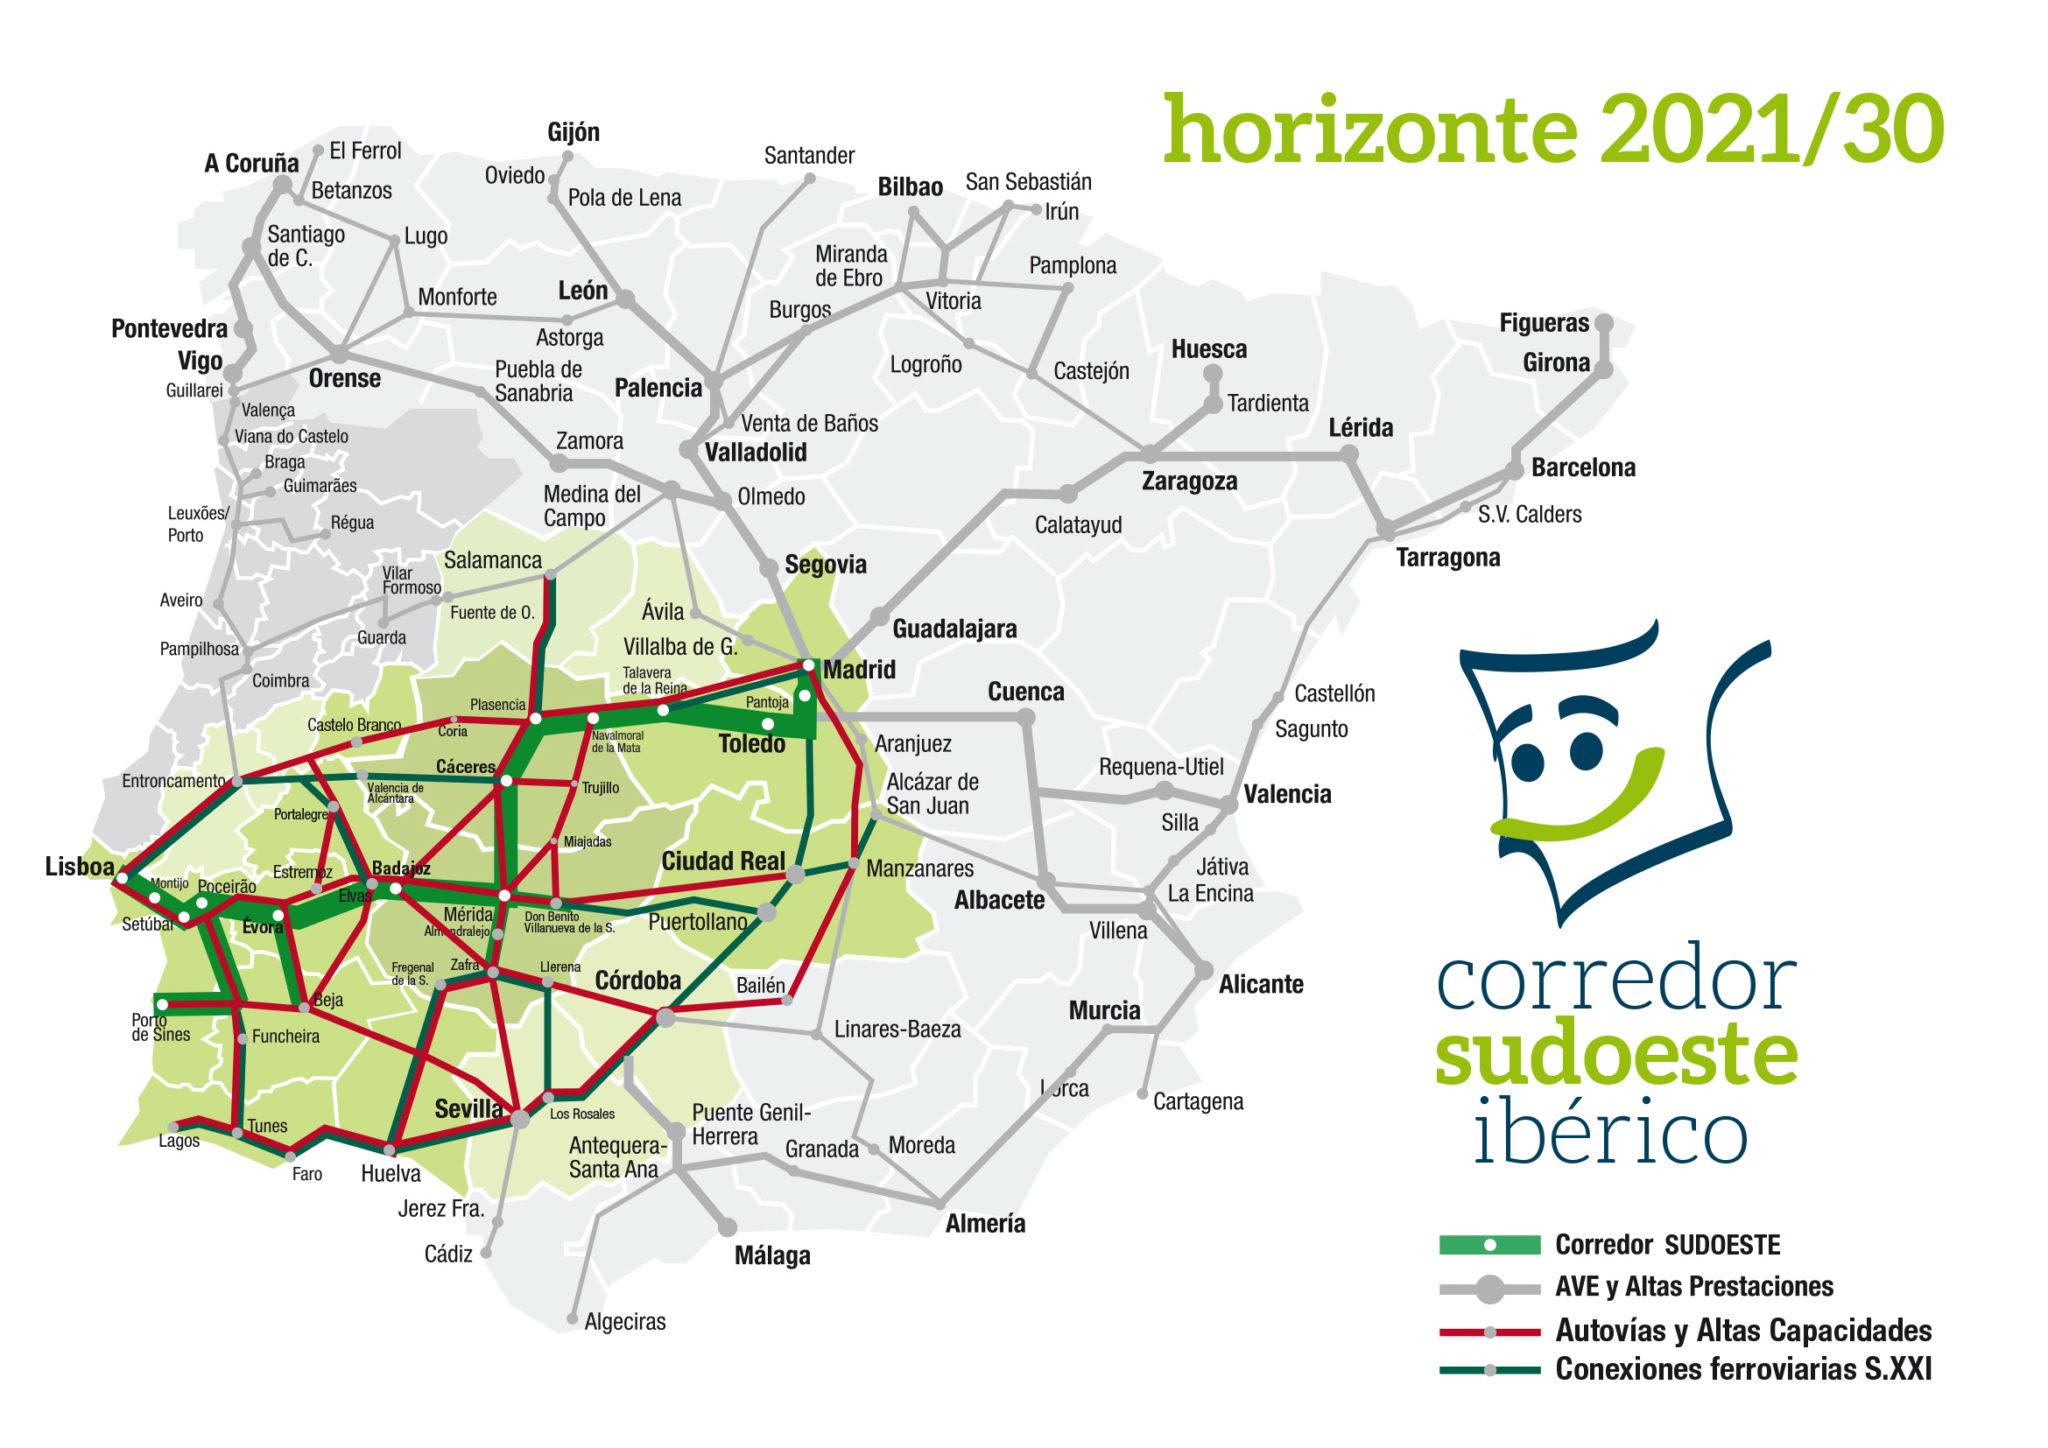 mapa-corredor-sudoeste-iberico-tren-ave-extremadura-mapa-conexiones